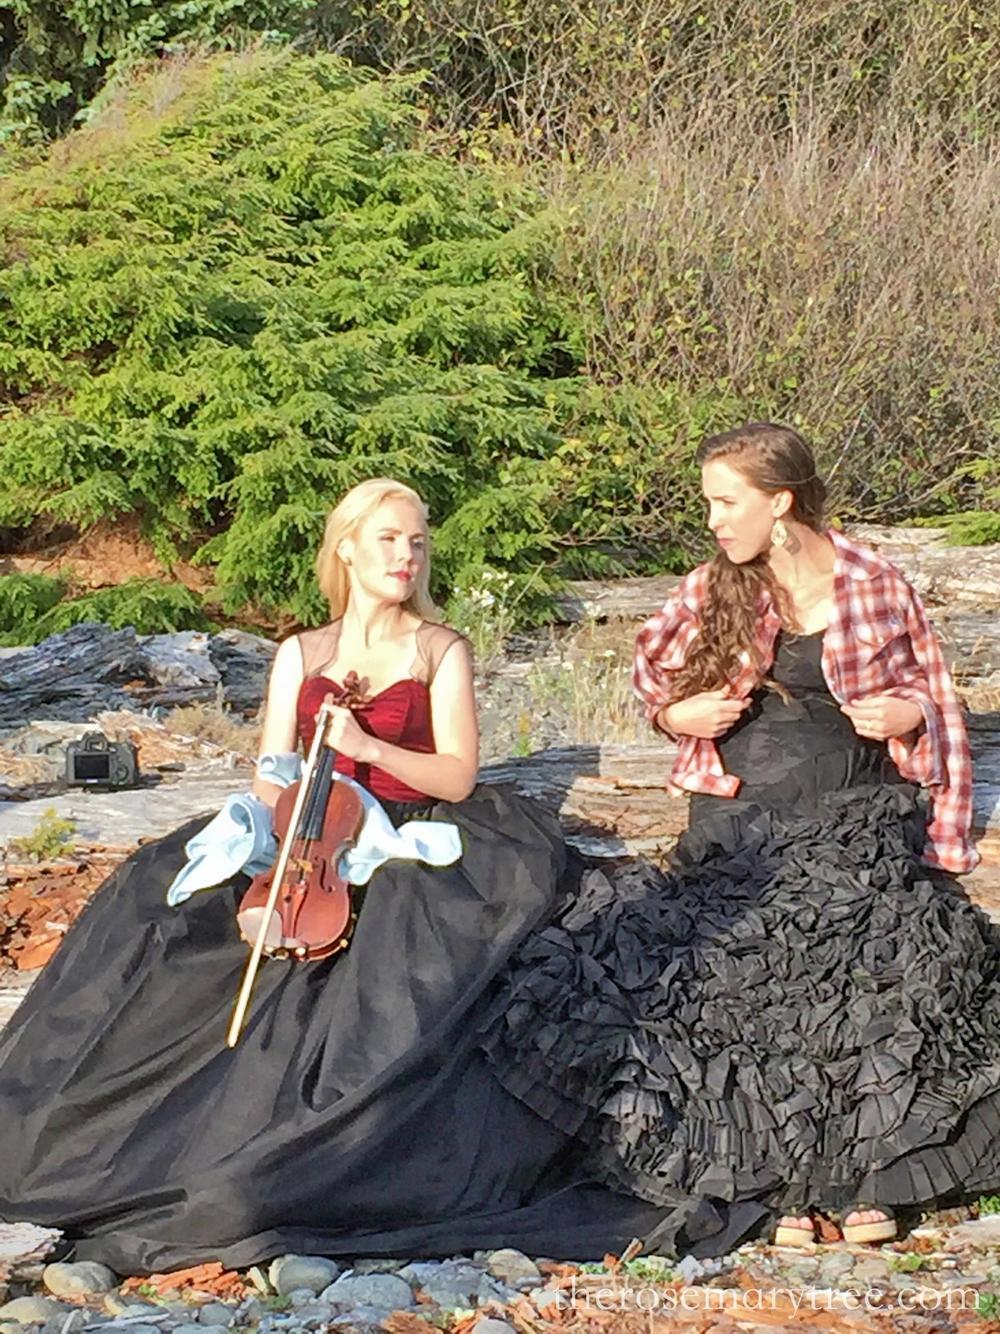 Annie & Gretchen with Coats